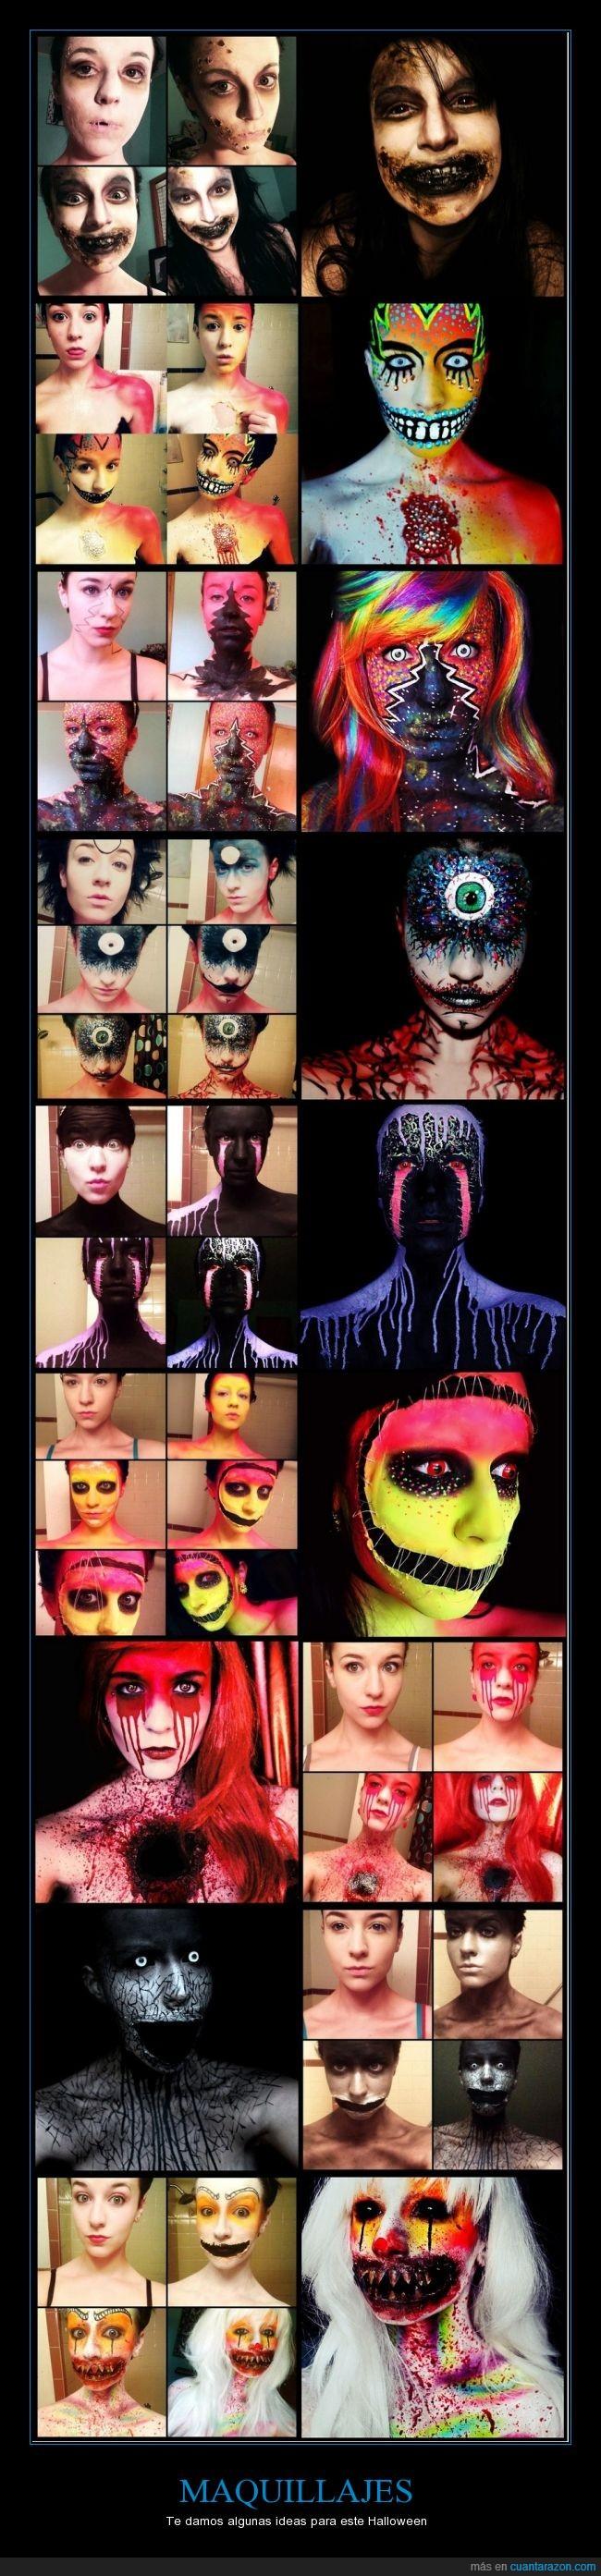 divertidos,fantasma,fiesta,Halloween,horror,maquillaje,monstruo,muertos,terror